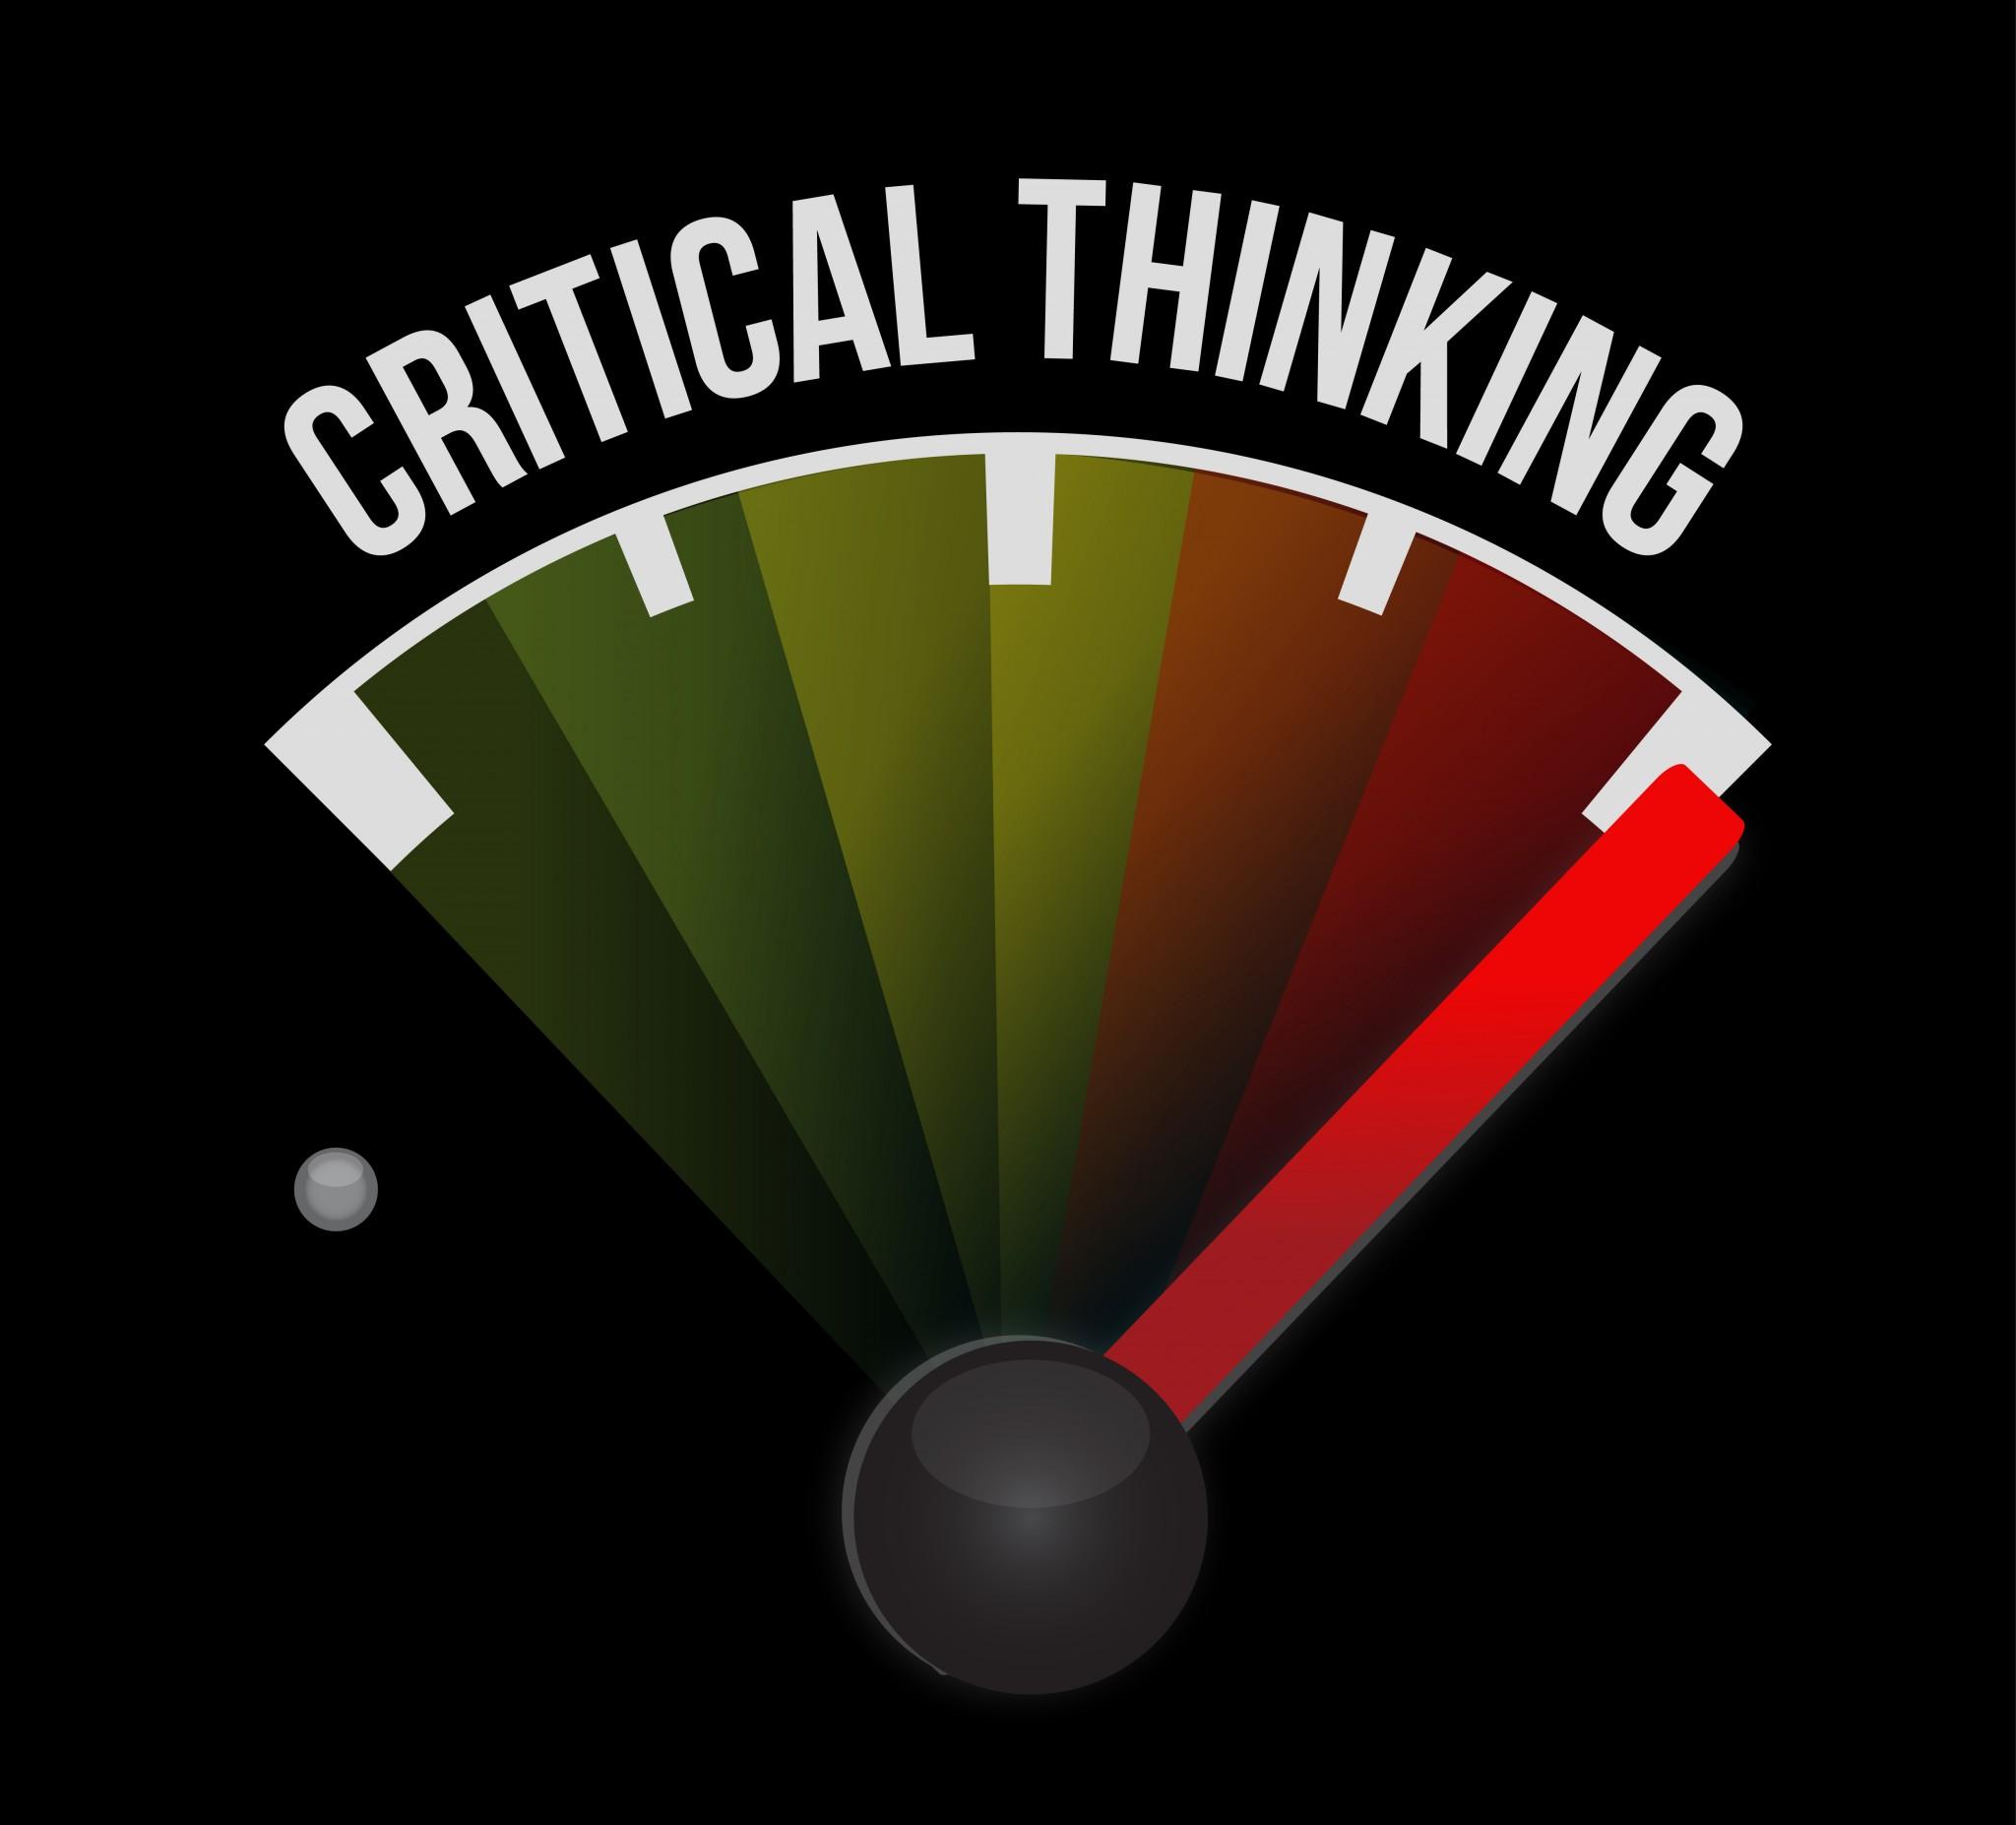 Critical thinking academy